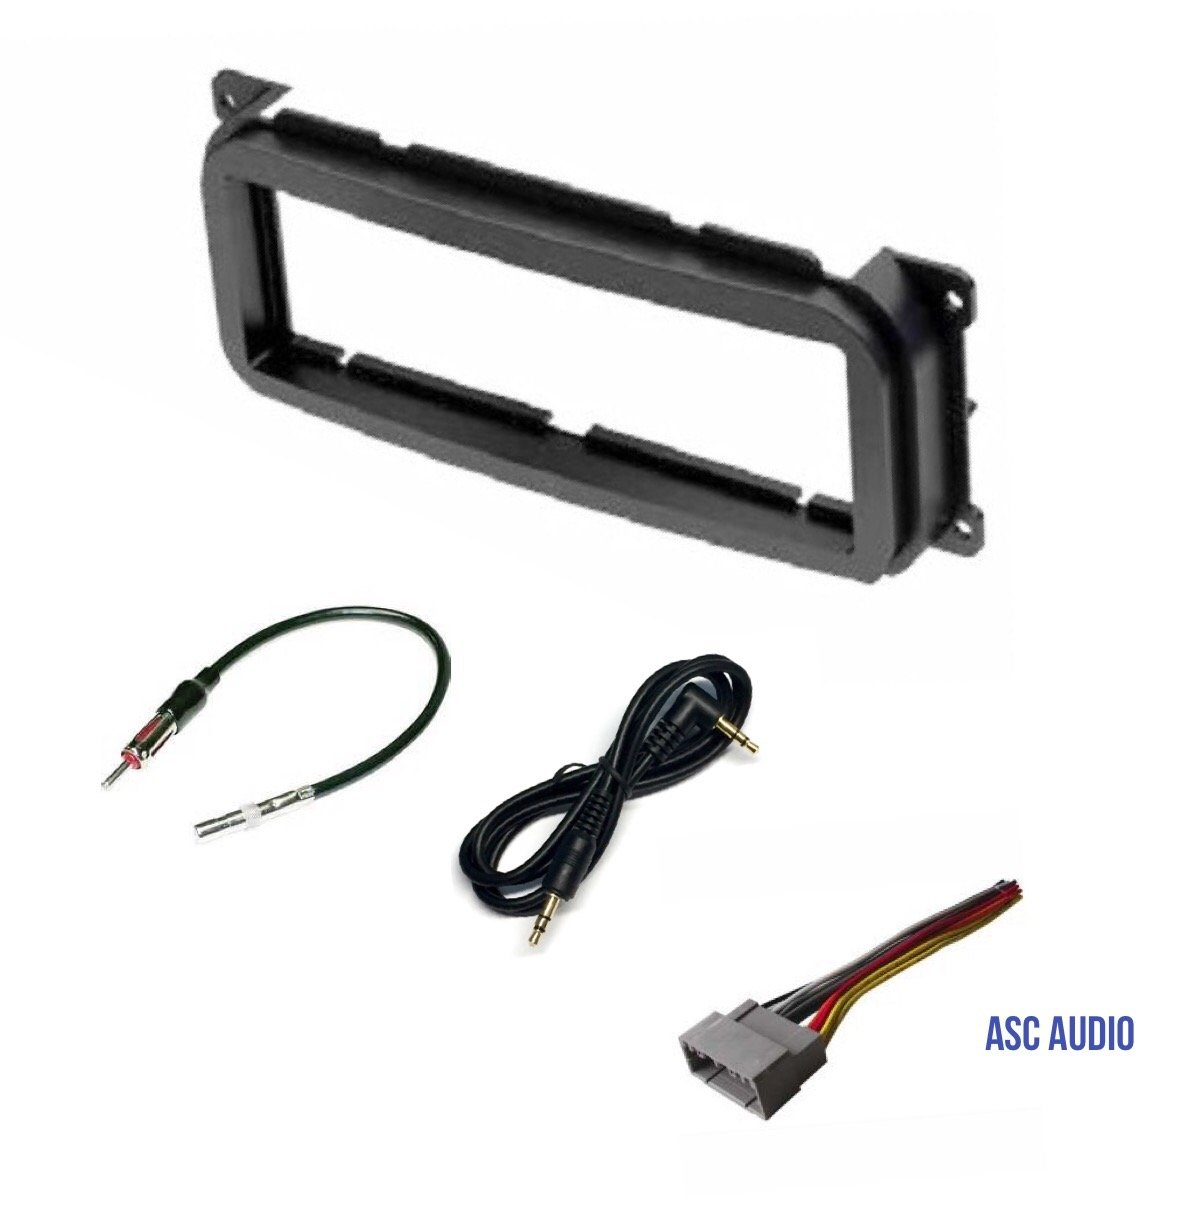 Single Din Car Stereo Dash Kit, Wire Harness, Antenna Adapter for some Dodge 02-07 Caravan, 02-04 Dakota, 02-03 Durango, 02-05 Intrepid, 02-06 Neon, 02-05 Ram 1500, 03-05 Ram 2500/3500, 02-06 Stratus